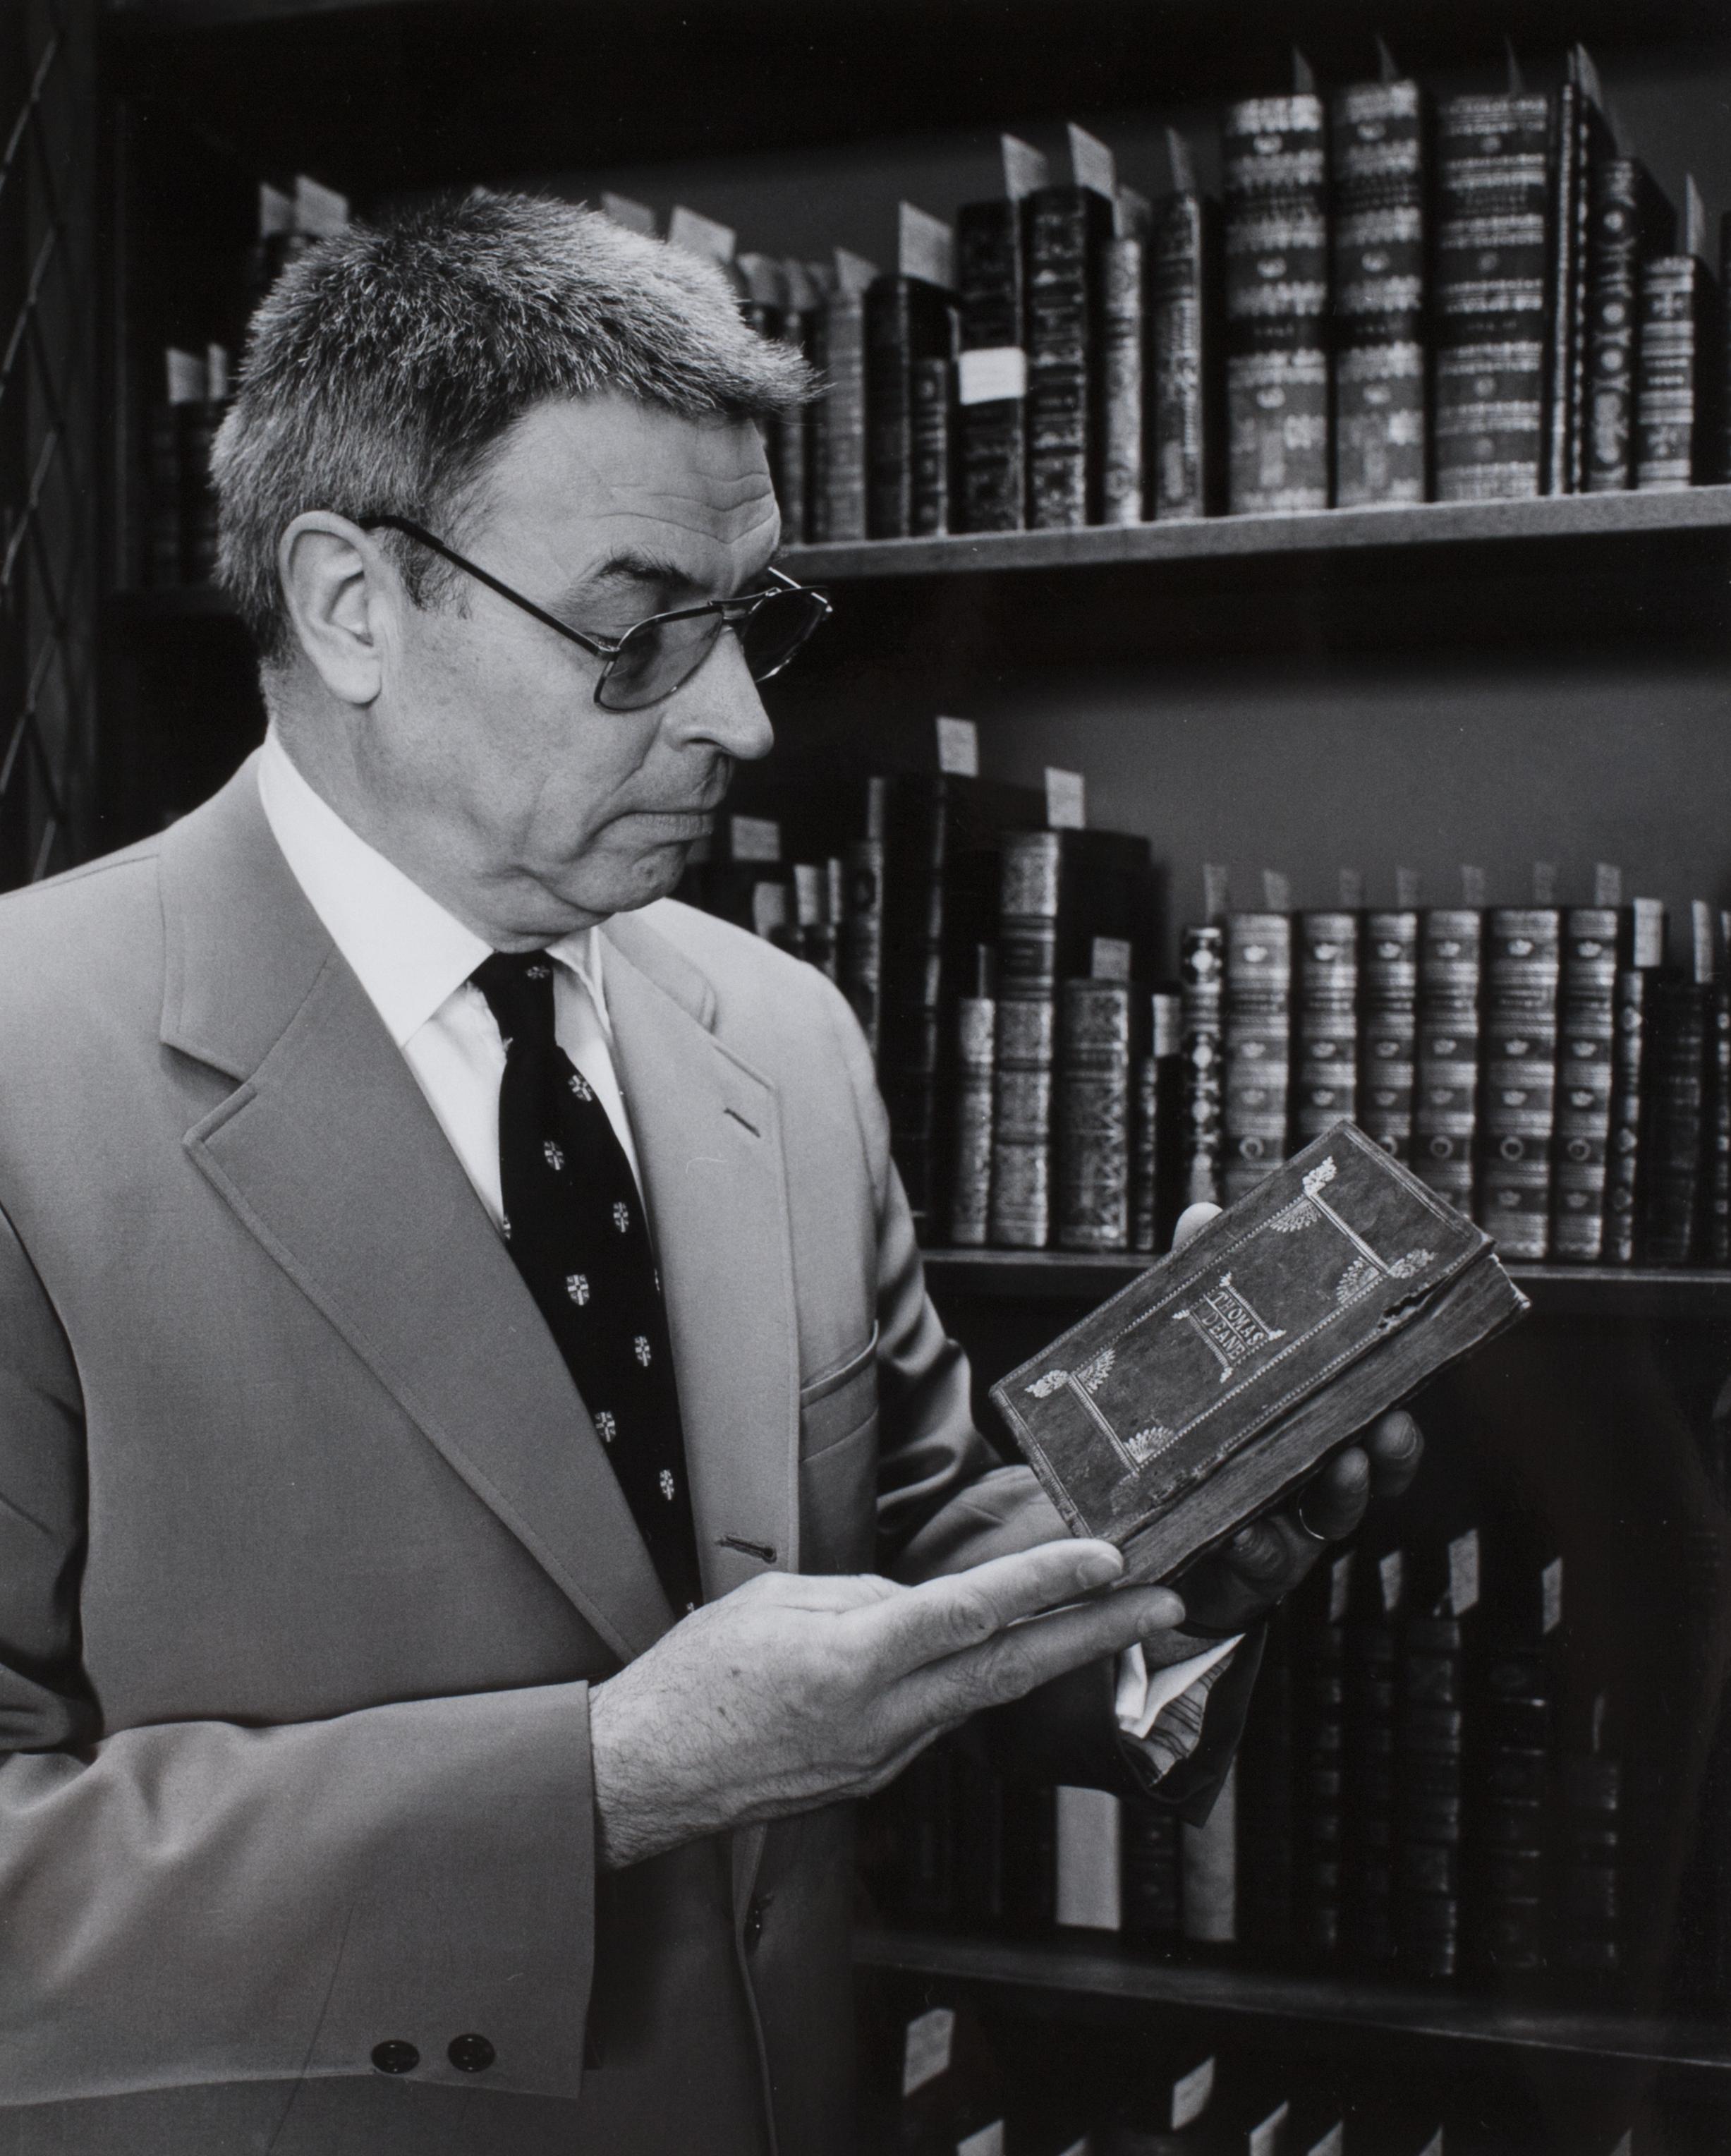 Marcus A. McCorison